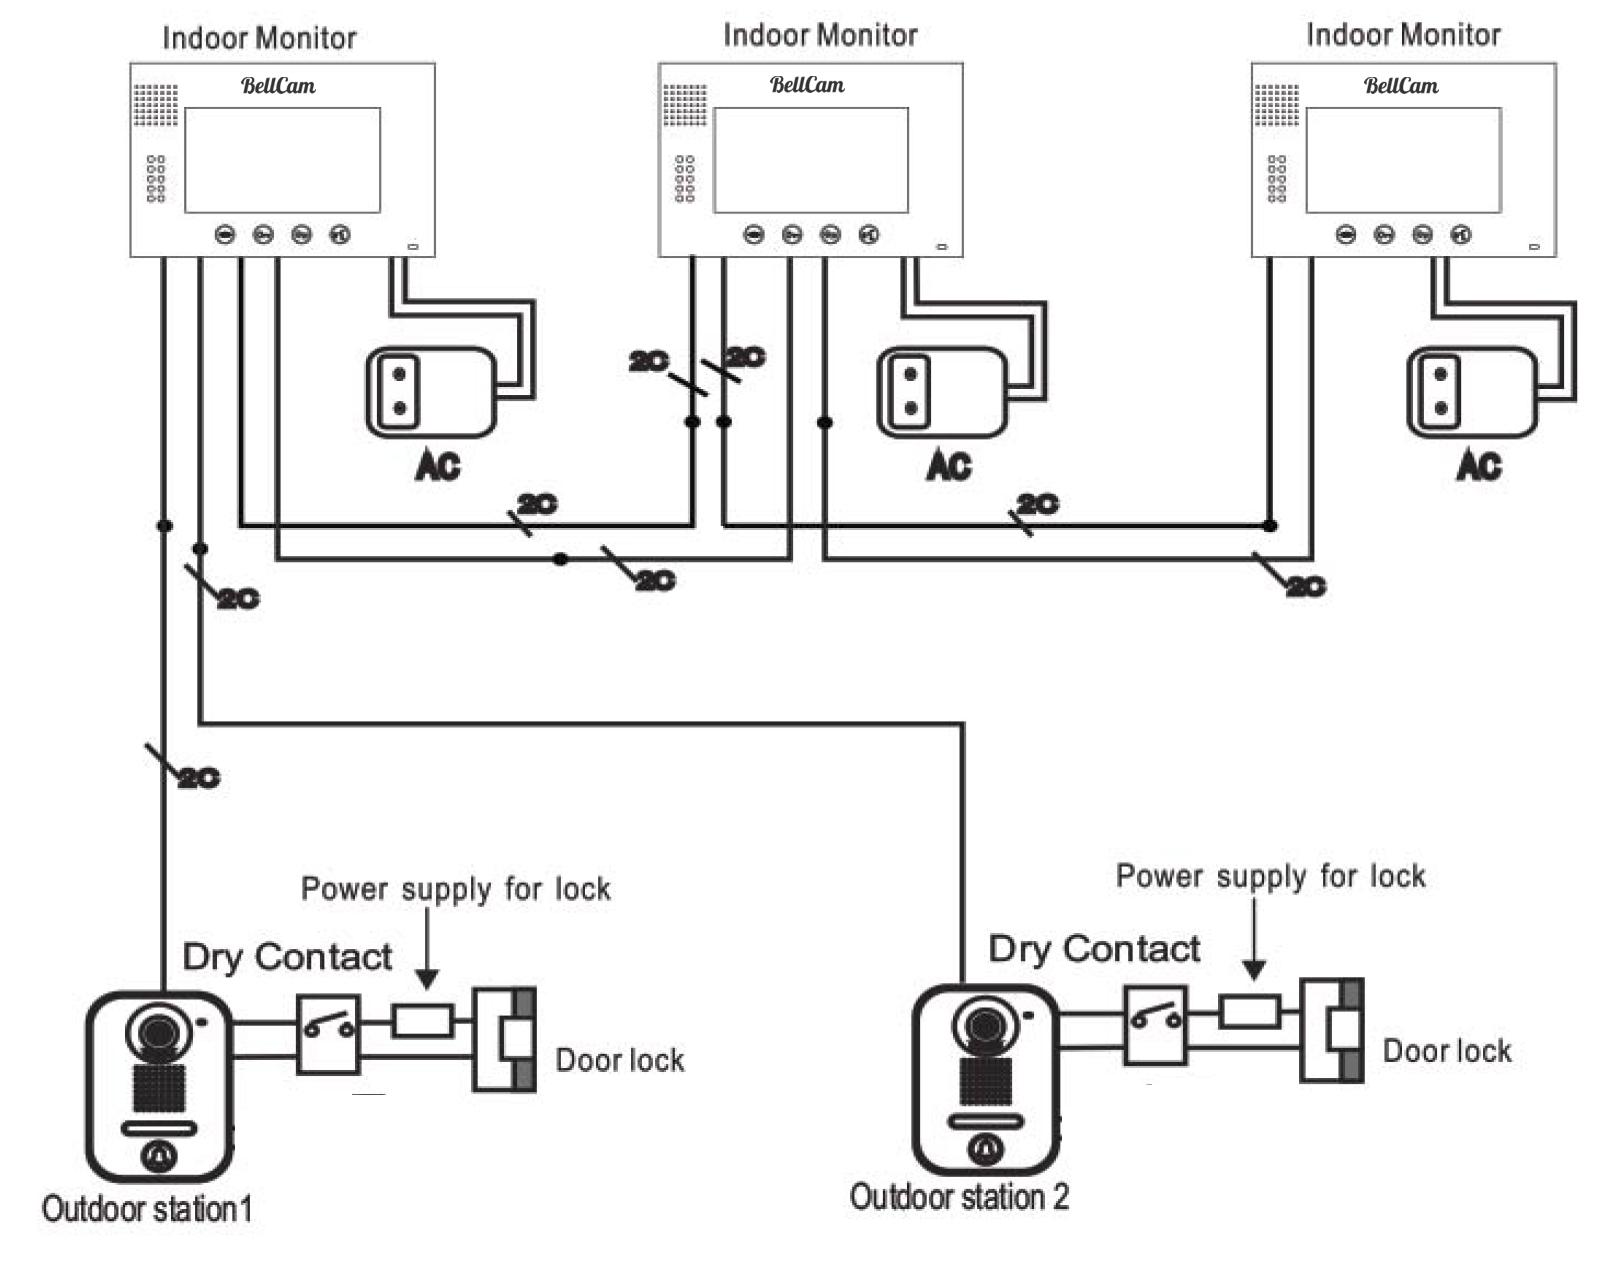 Bellcam 2-wire video intercom system diagram